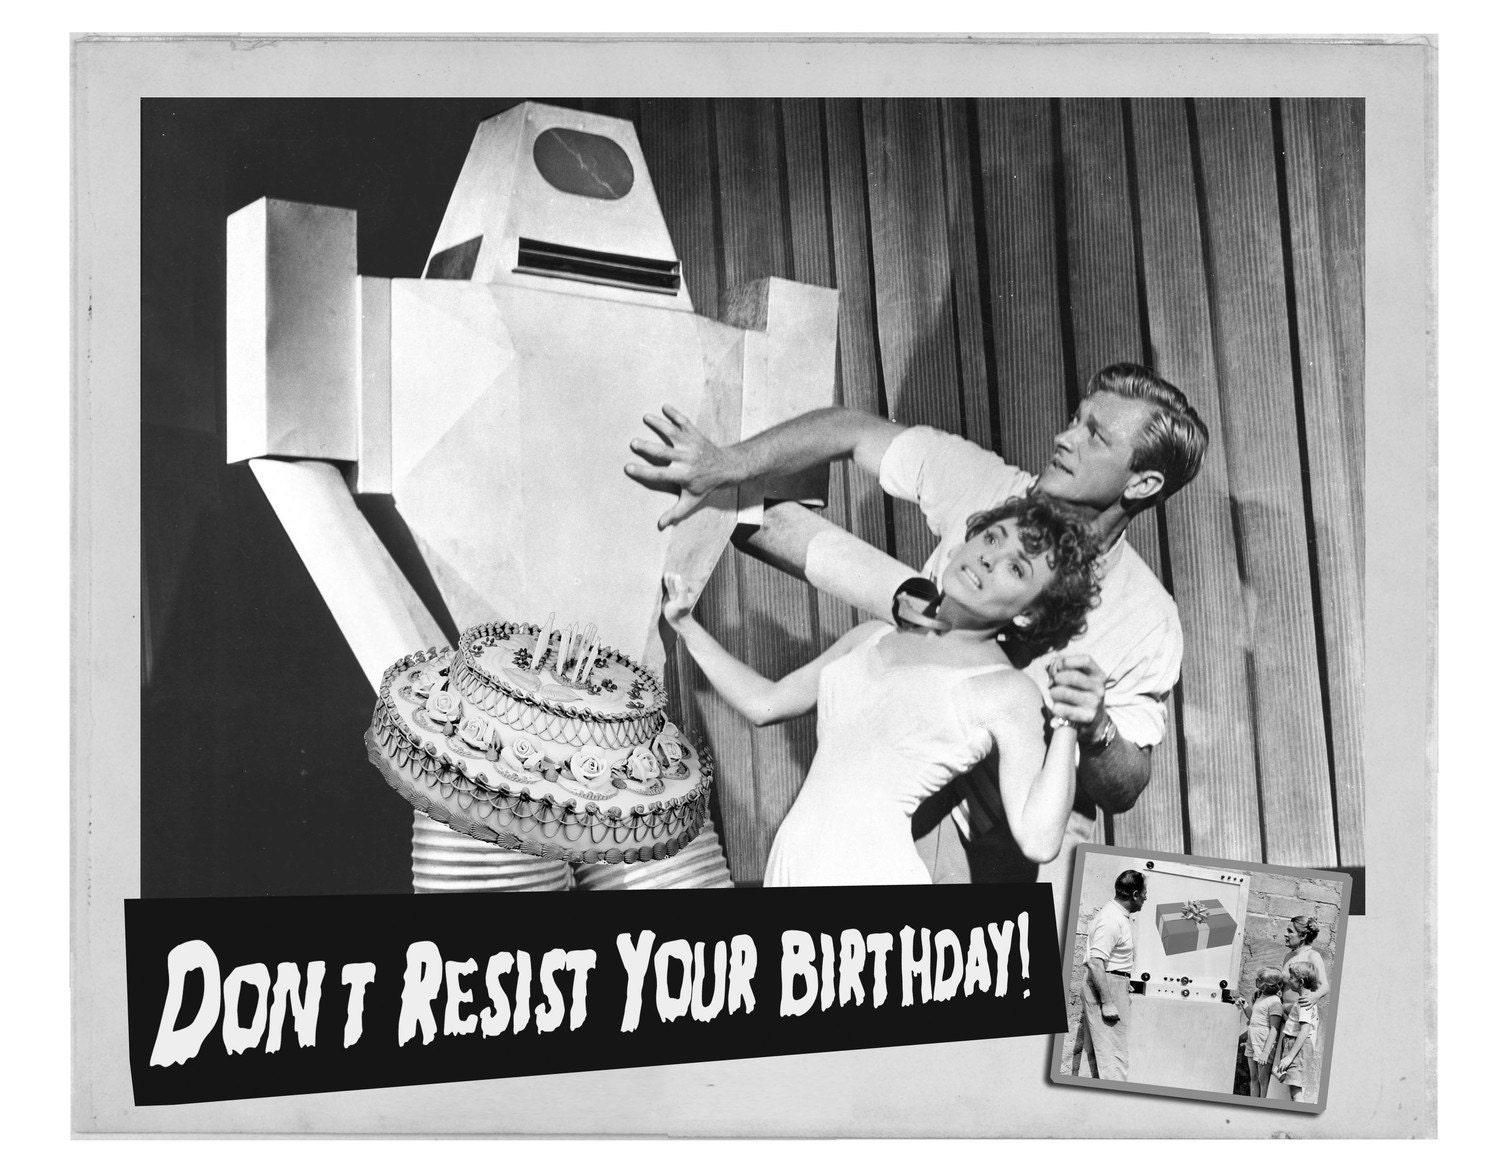 Birthday Card Robots Birthday Cards black and white Retro – Alternative Birthday Greetings